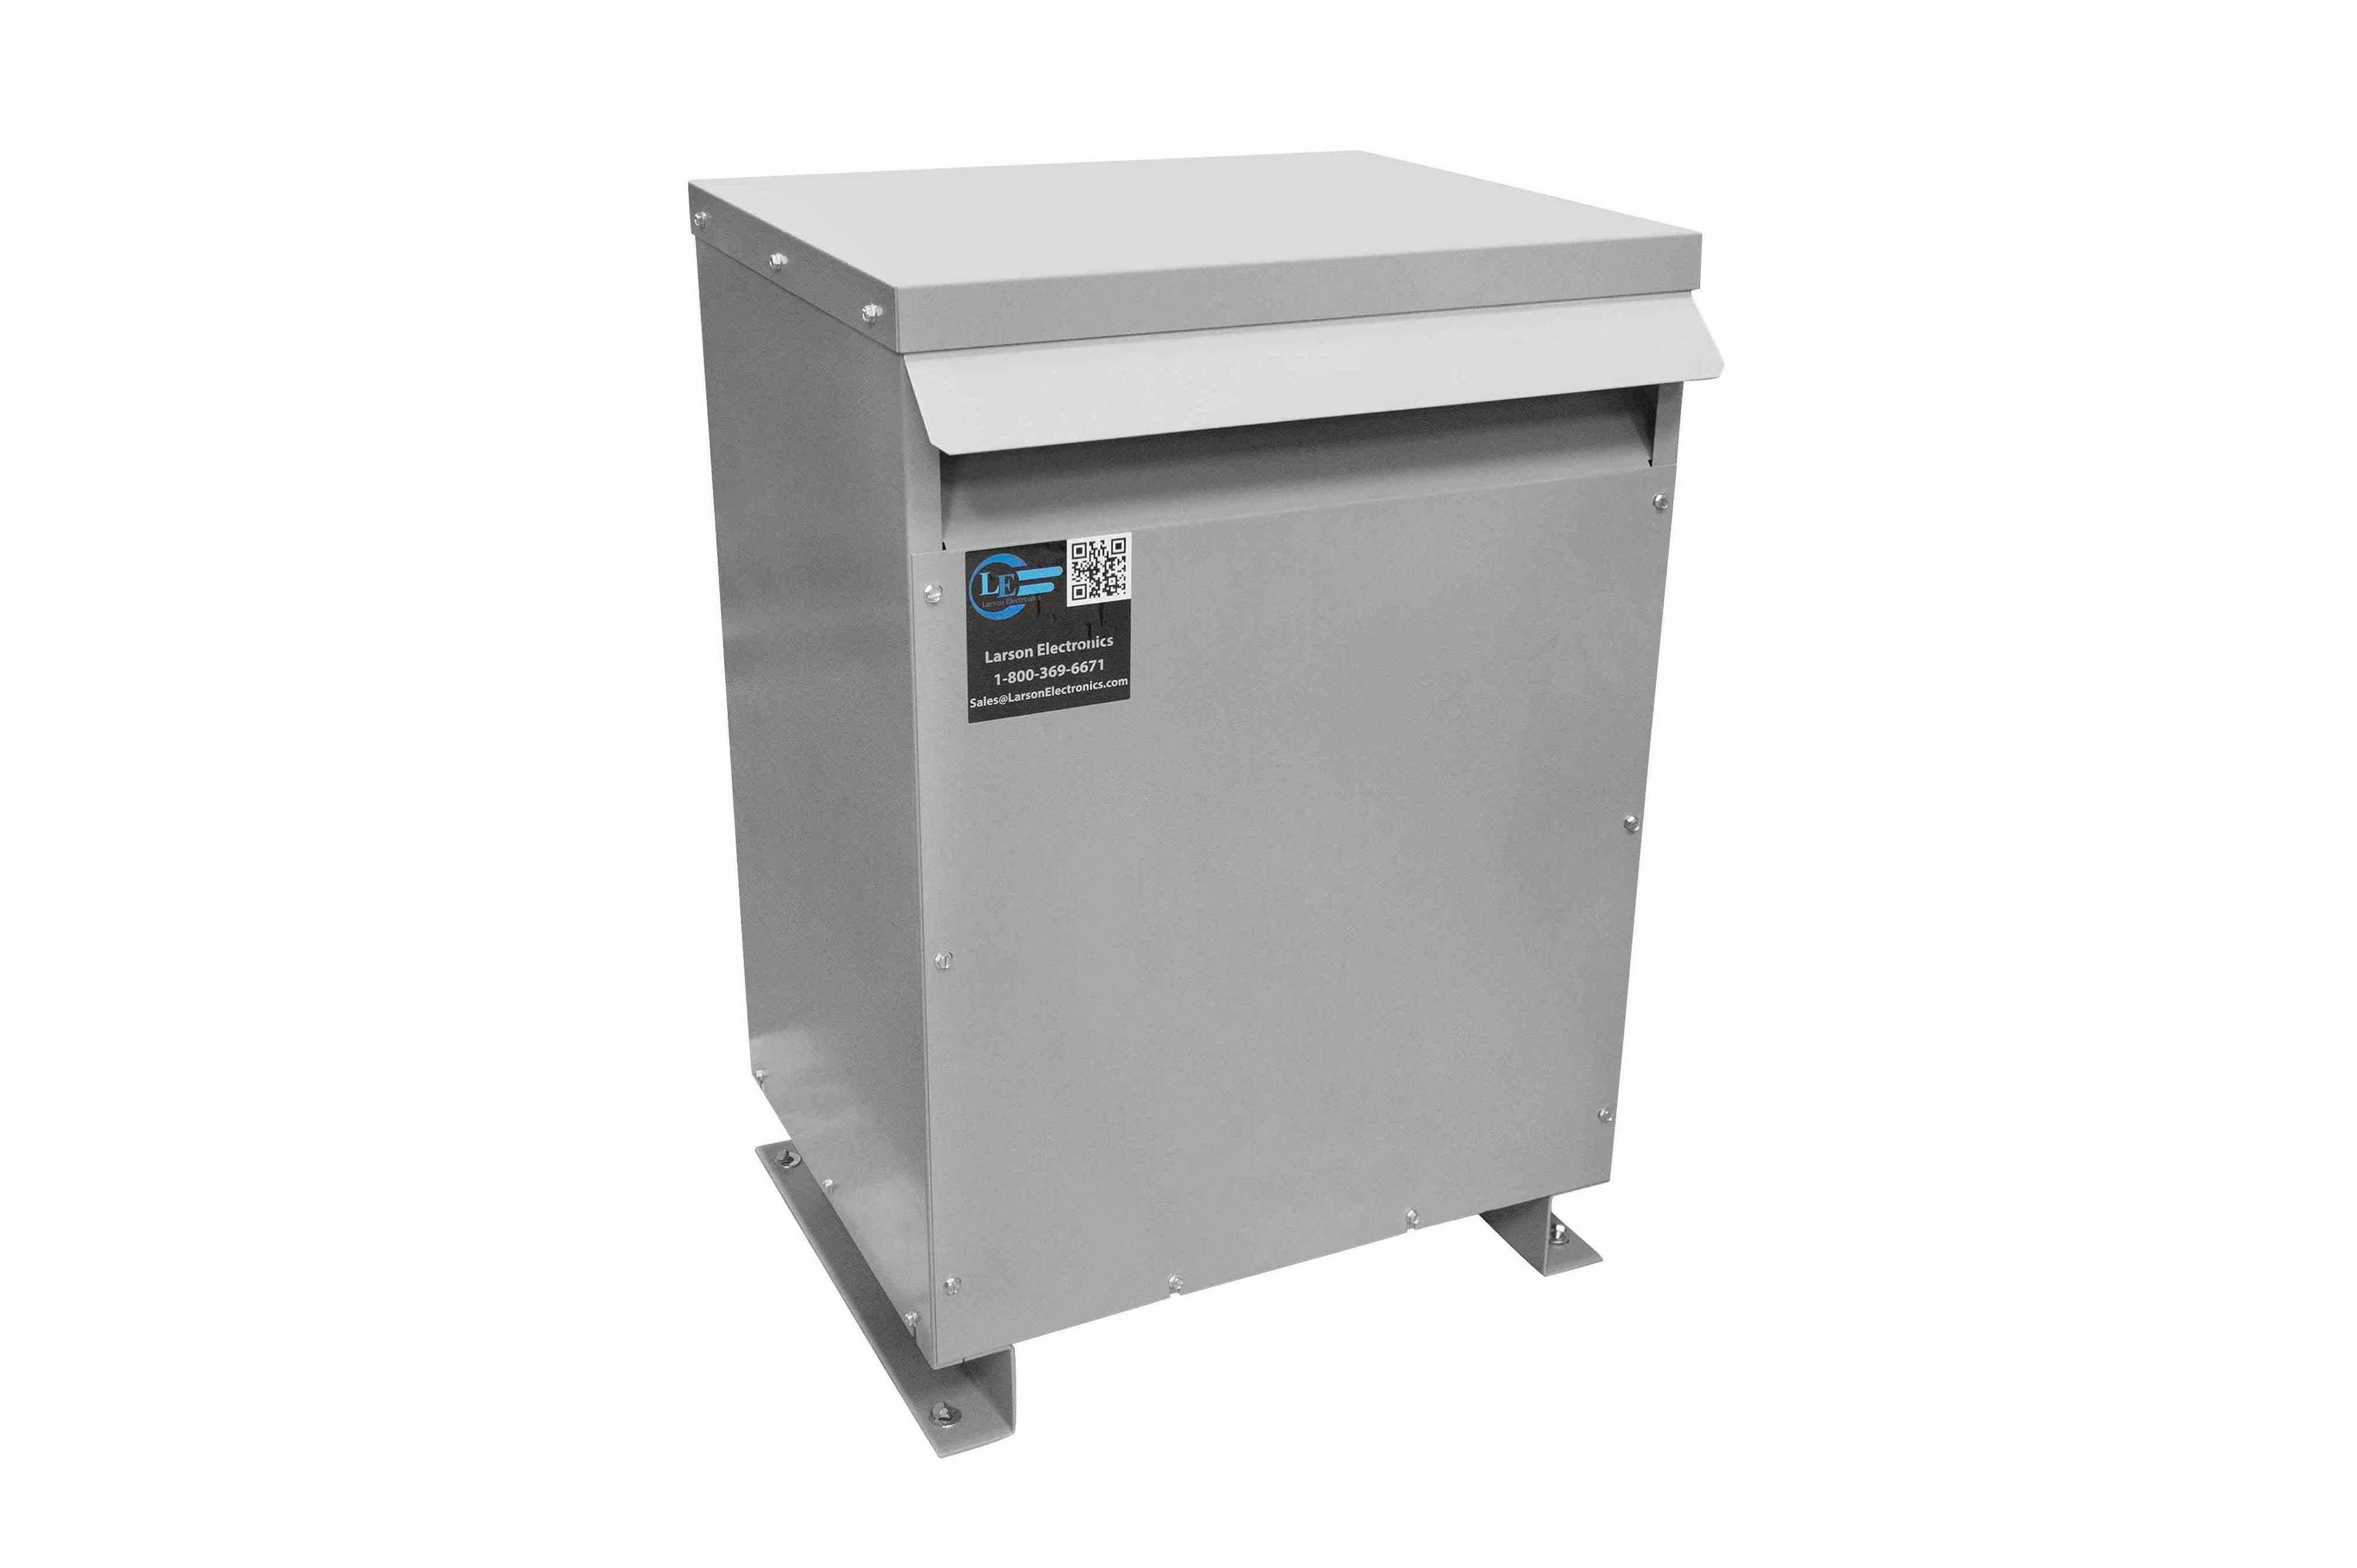 20 kVA 3PH Isolation Transformer, 460V Wye Primary, 208Y/120 Wye-N Secondary, N3R, Ventilated, 60 Hz